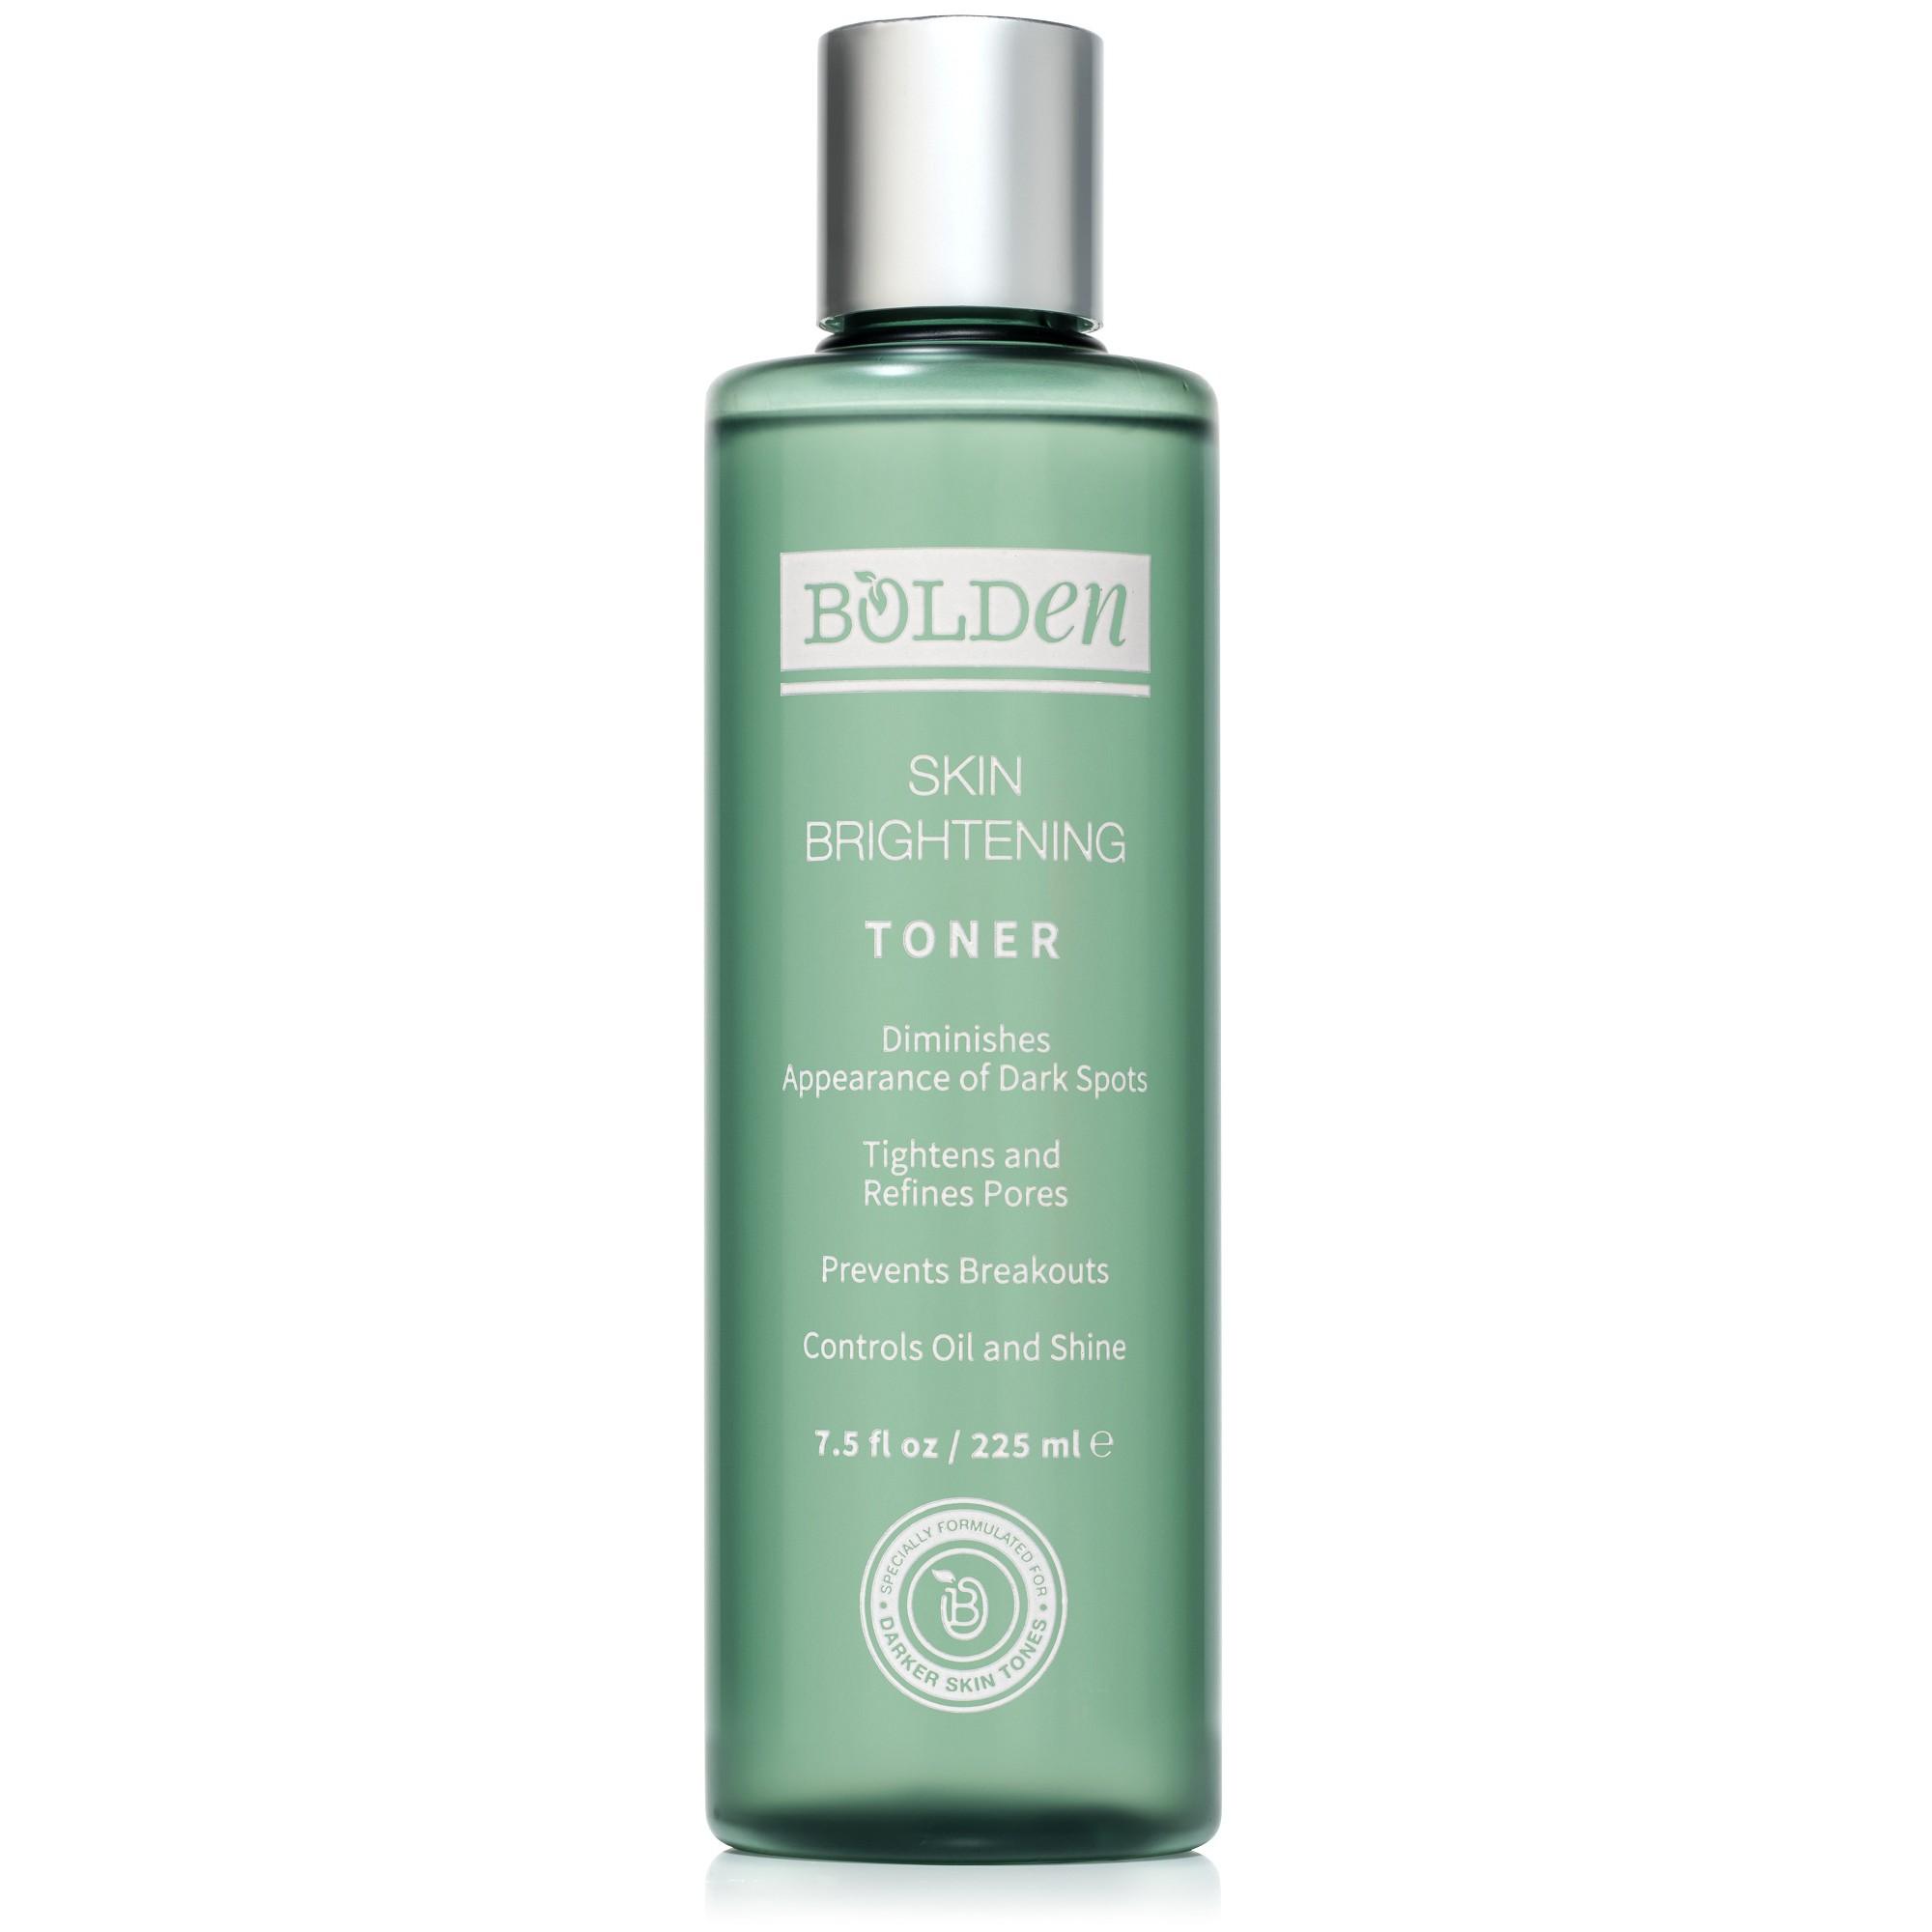 Bolden Skin Brightening Toner